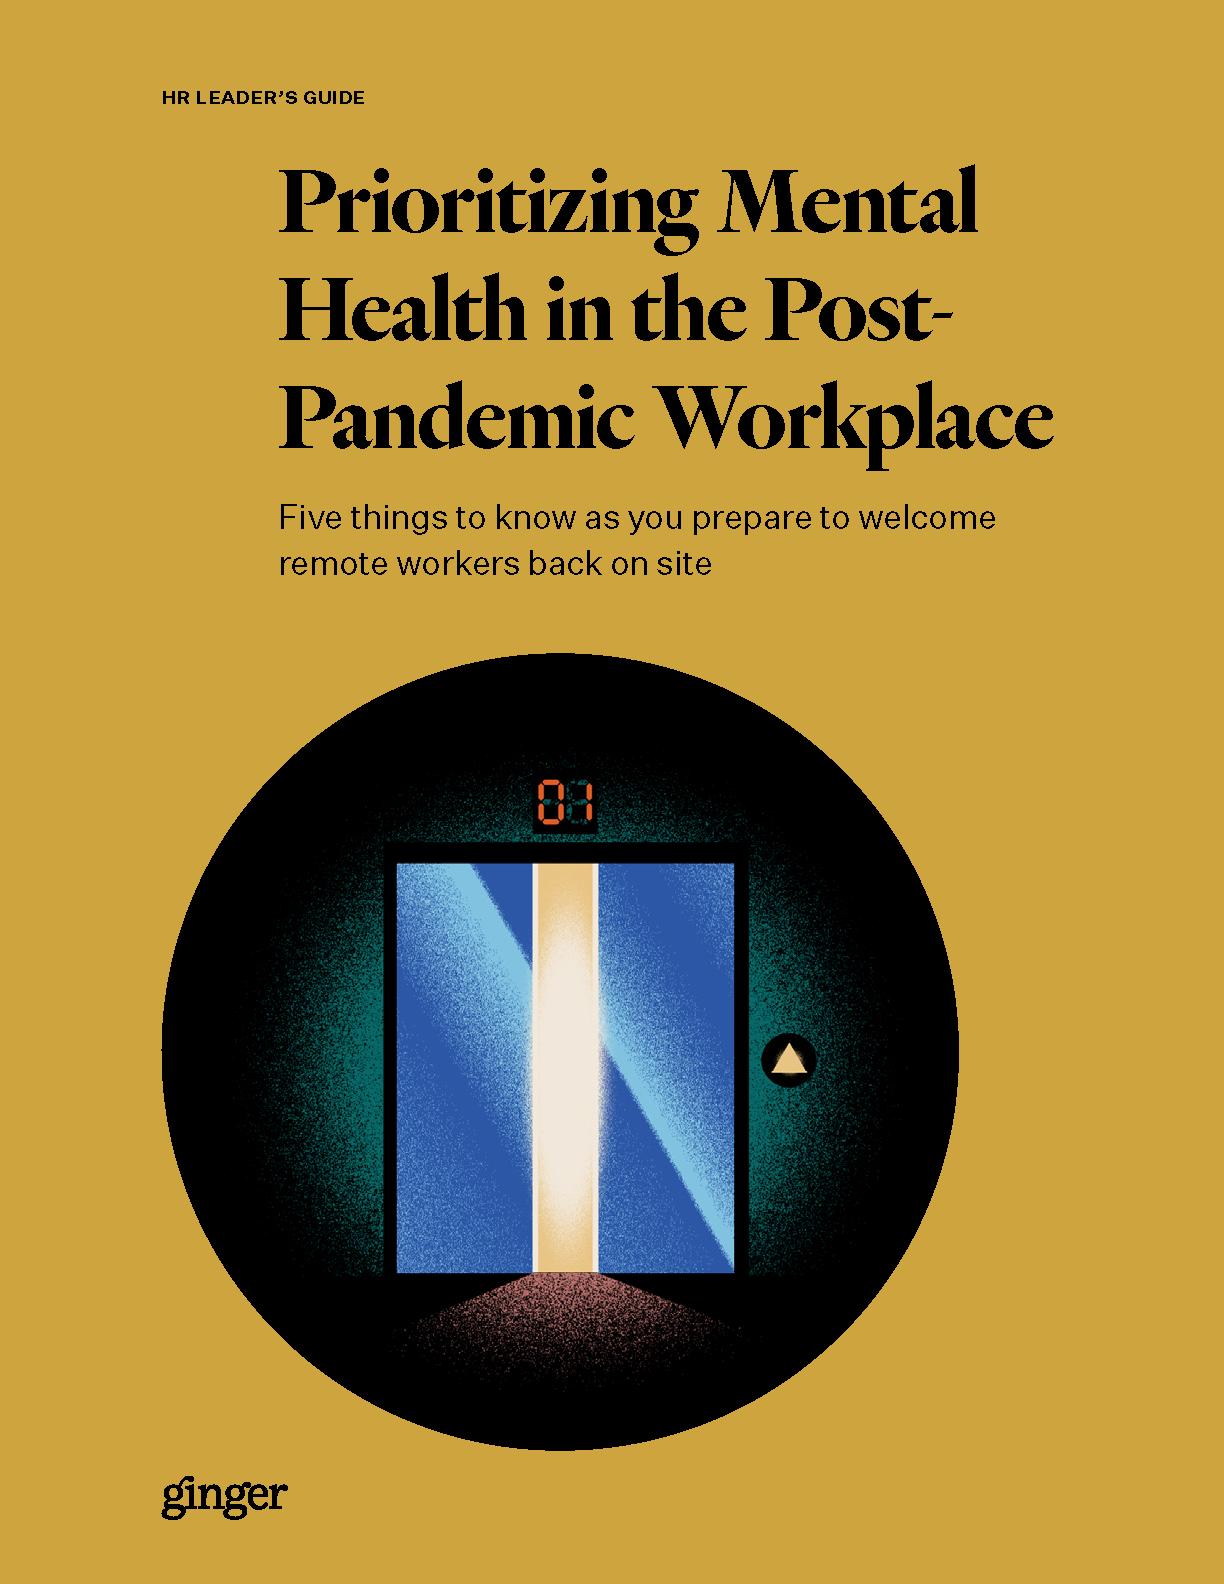 Prioritizing Mental Health as Part of Workforce Re-Entry